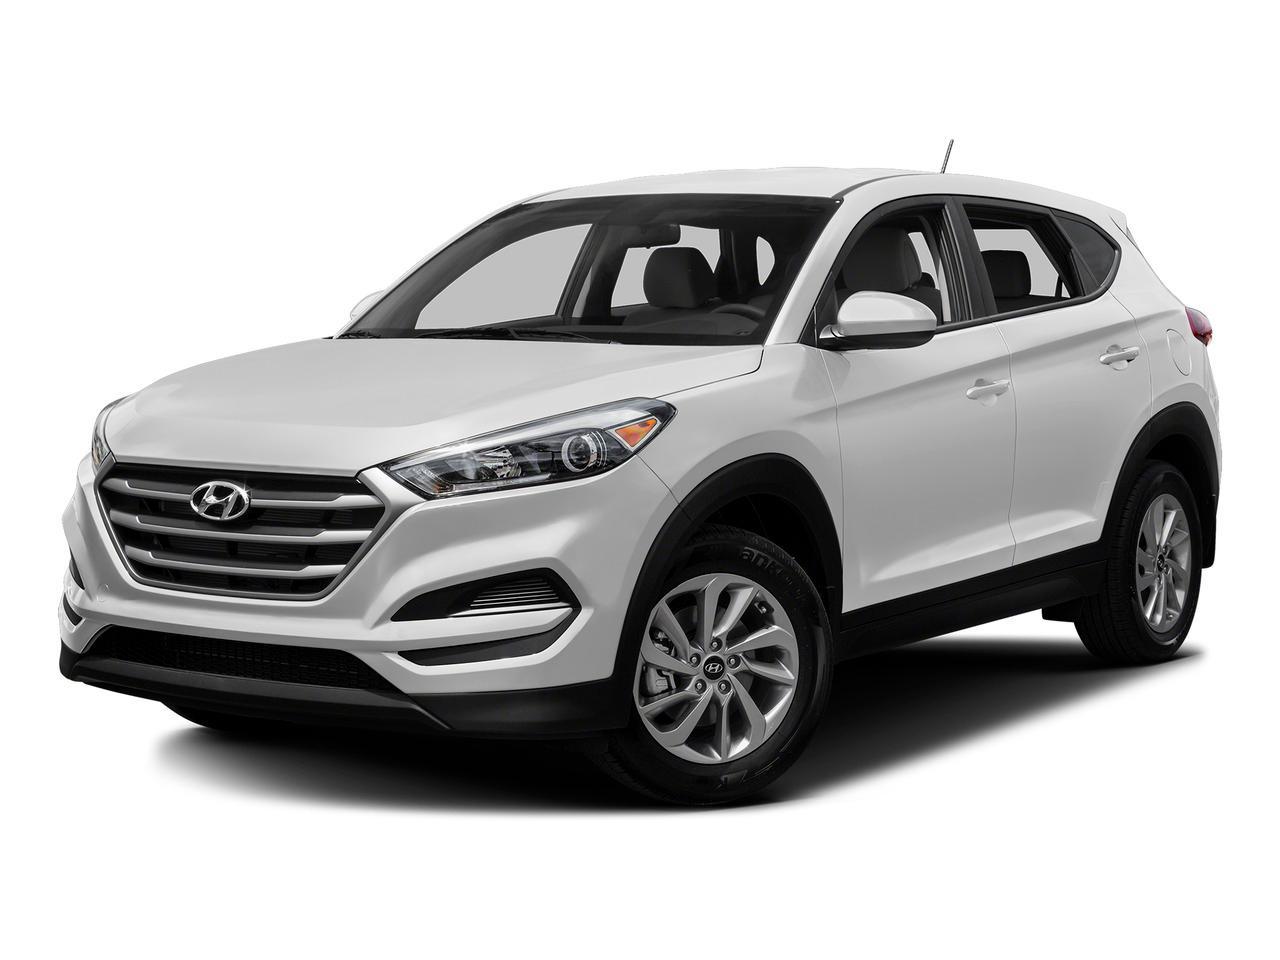 2016 Hyundai Tucson Vehicle Photo in Temple, TX 76502